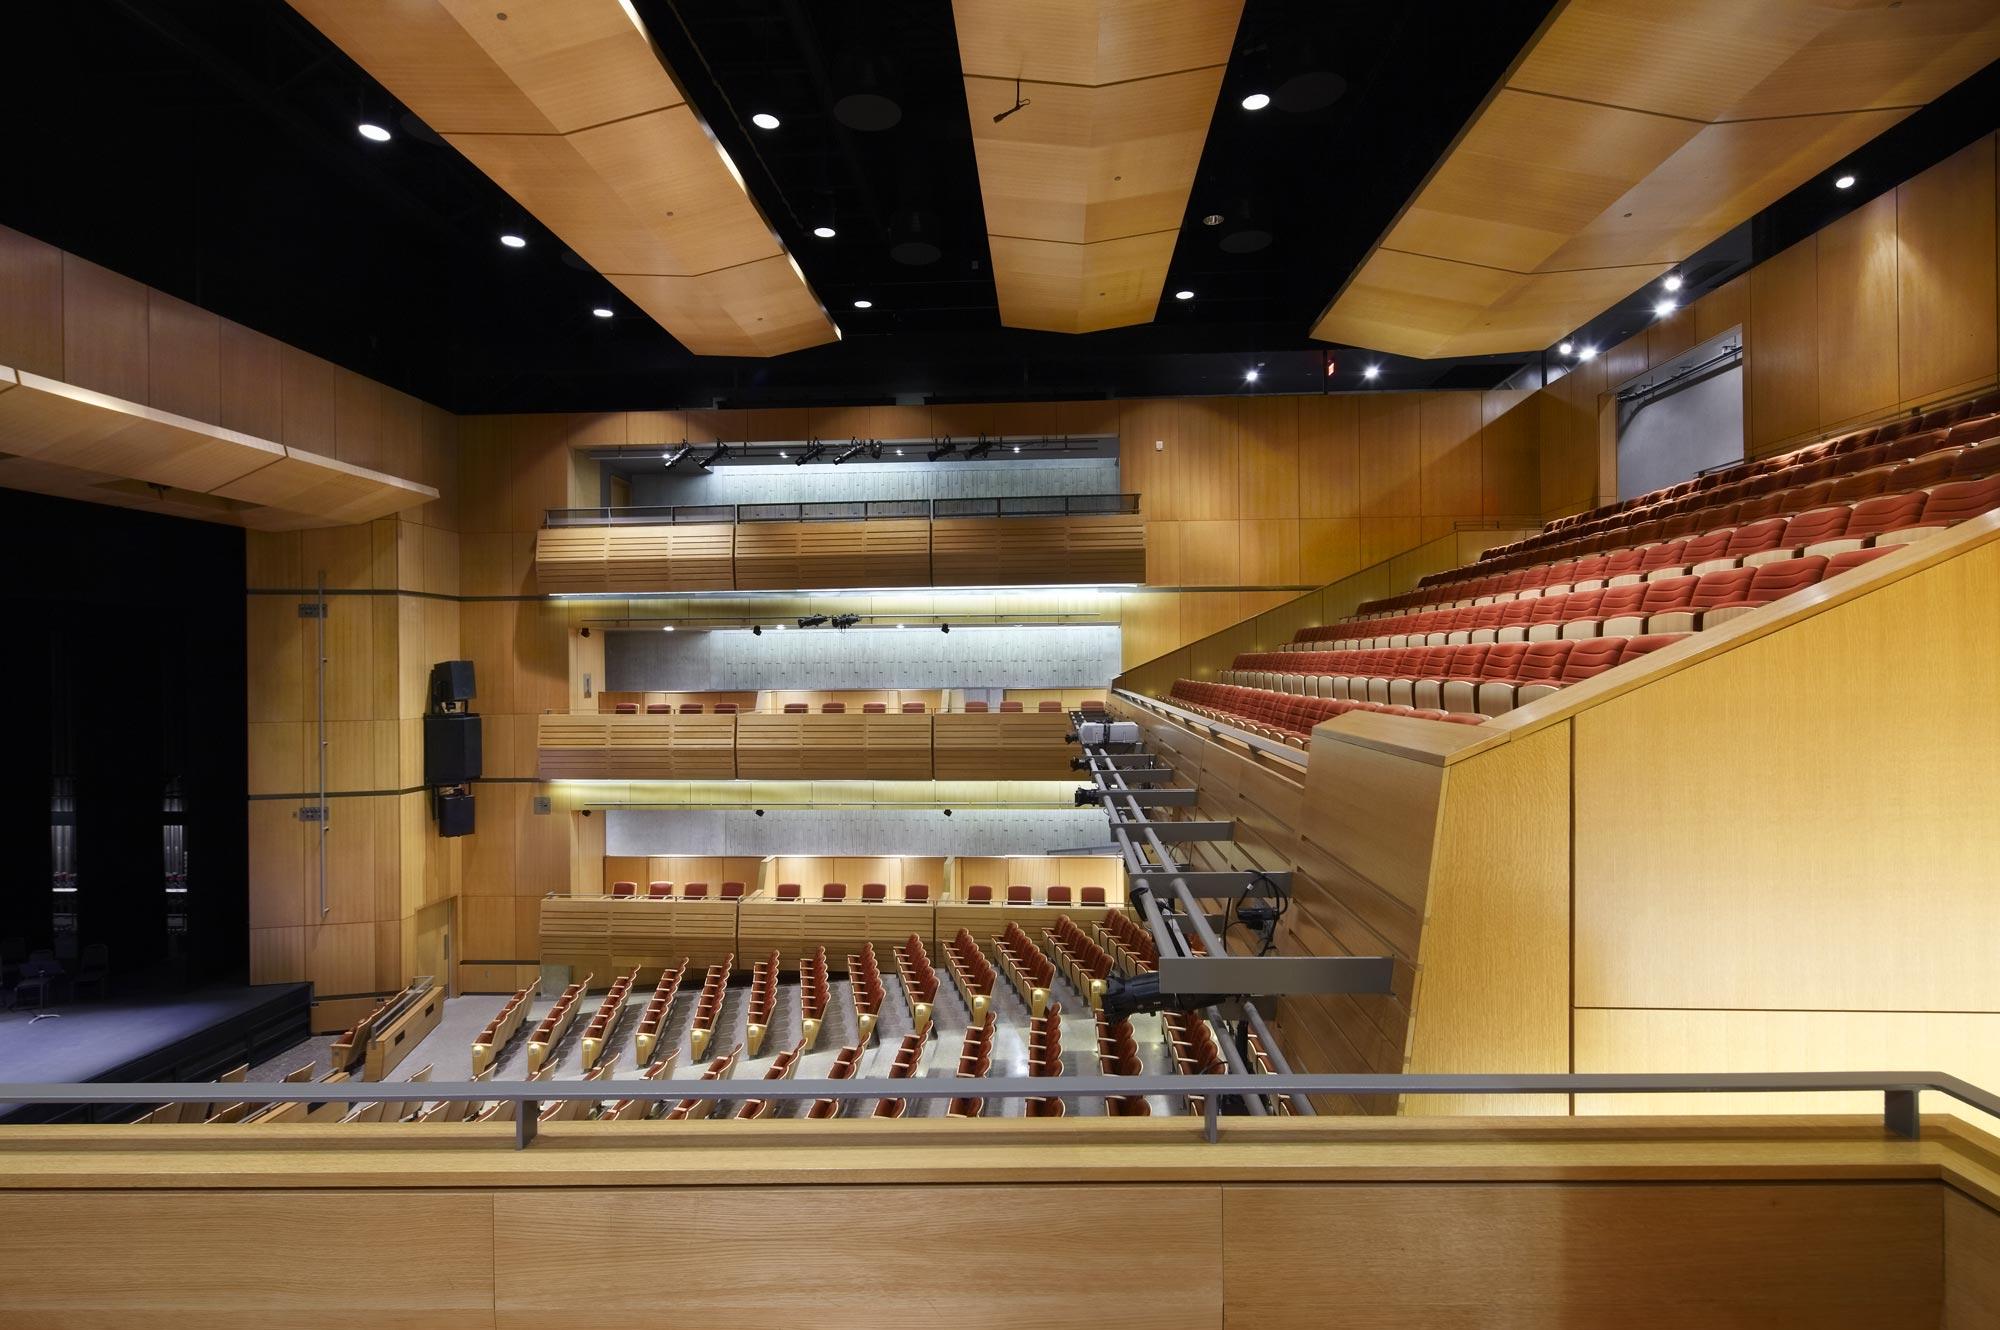 BPAC Main Theatre